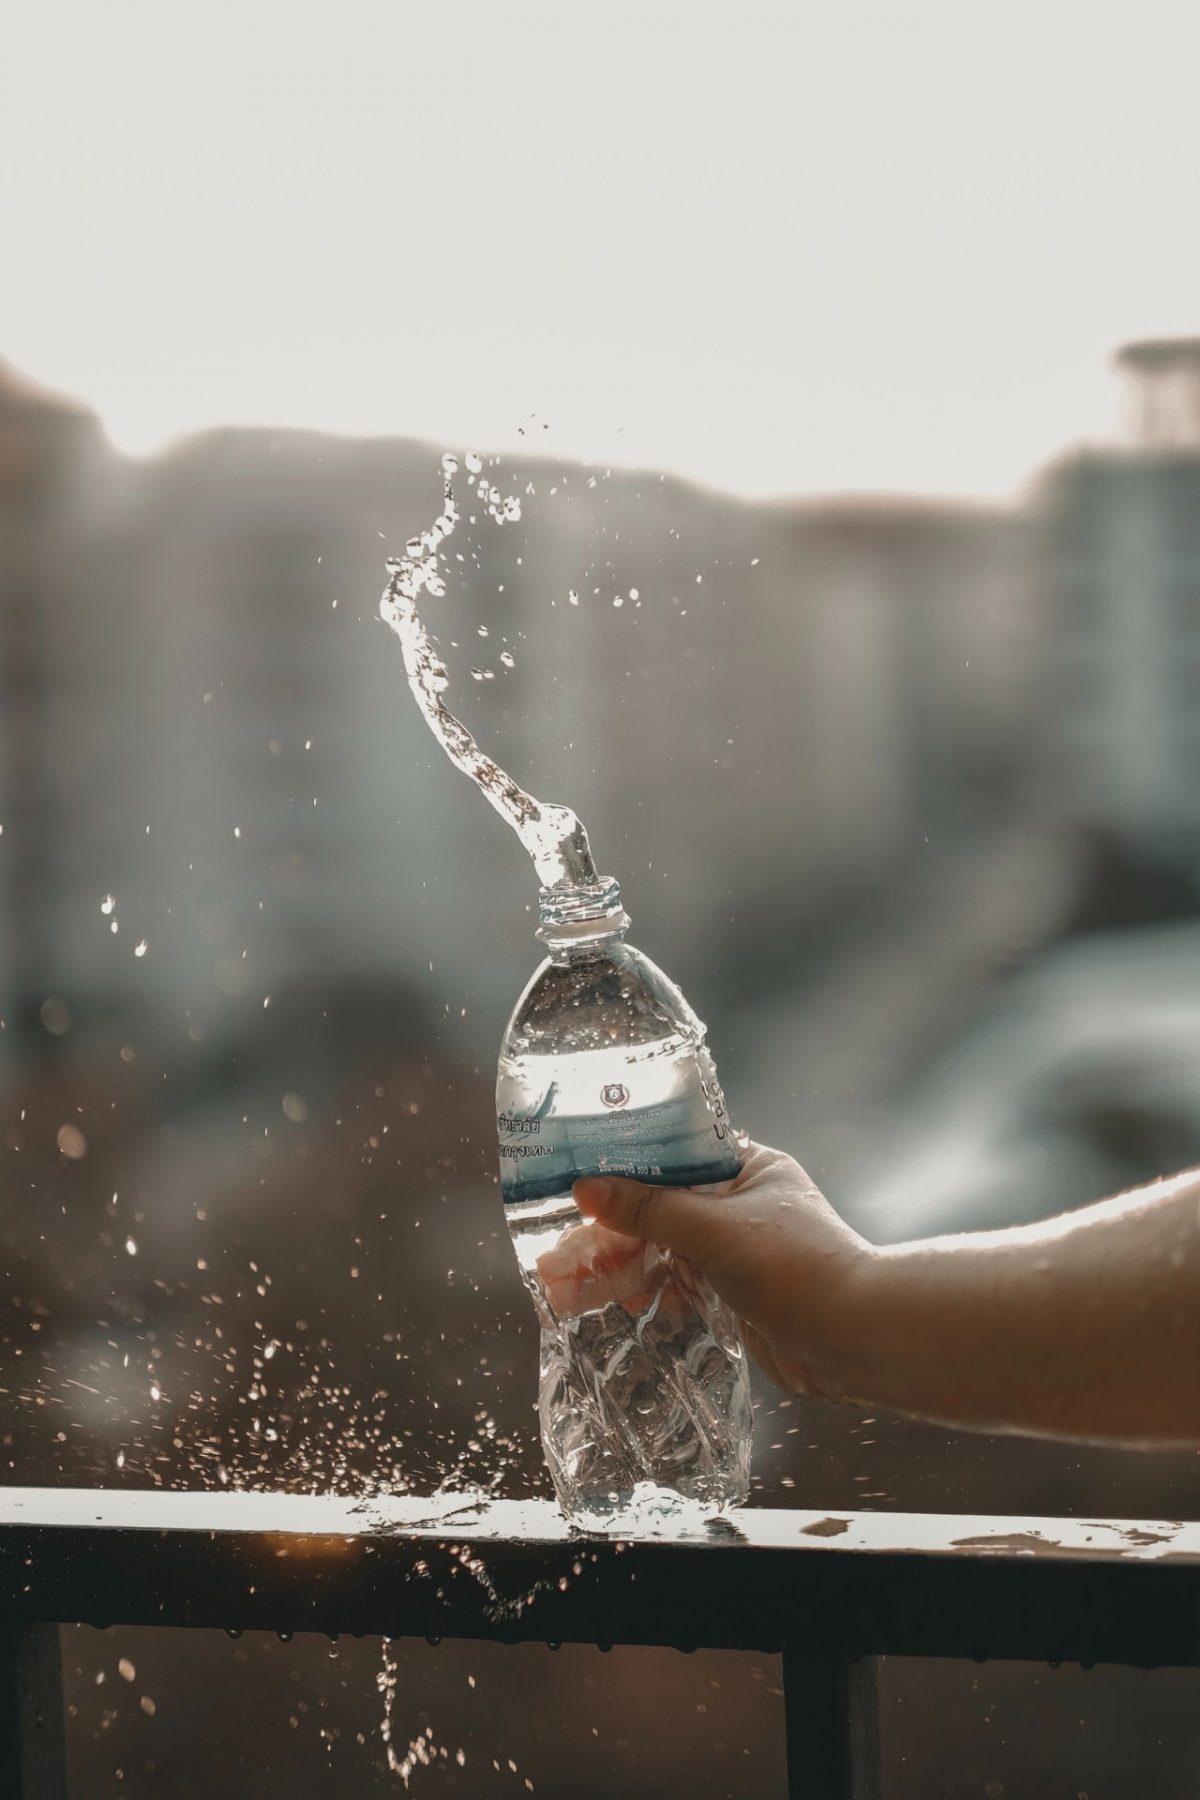 Botella de plastico de agua (Imagen: Unsplash)